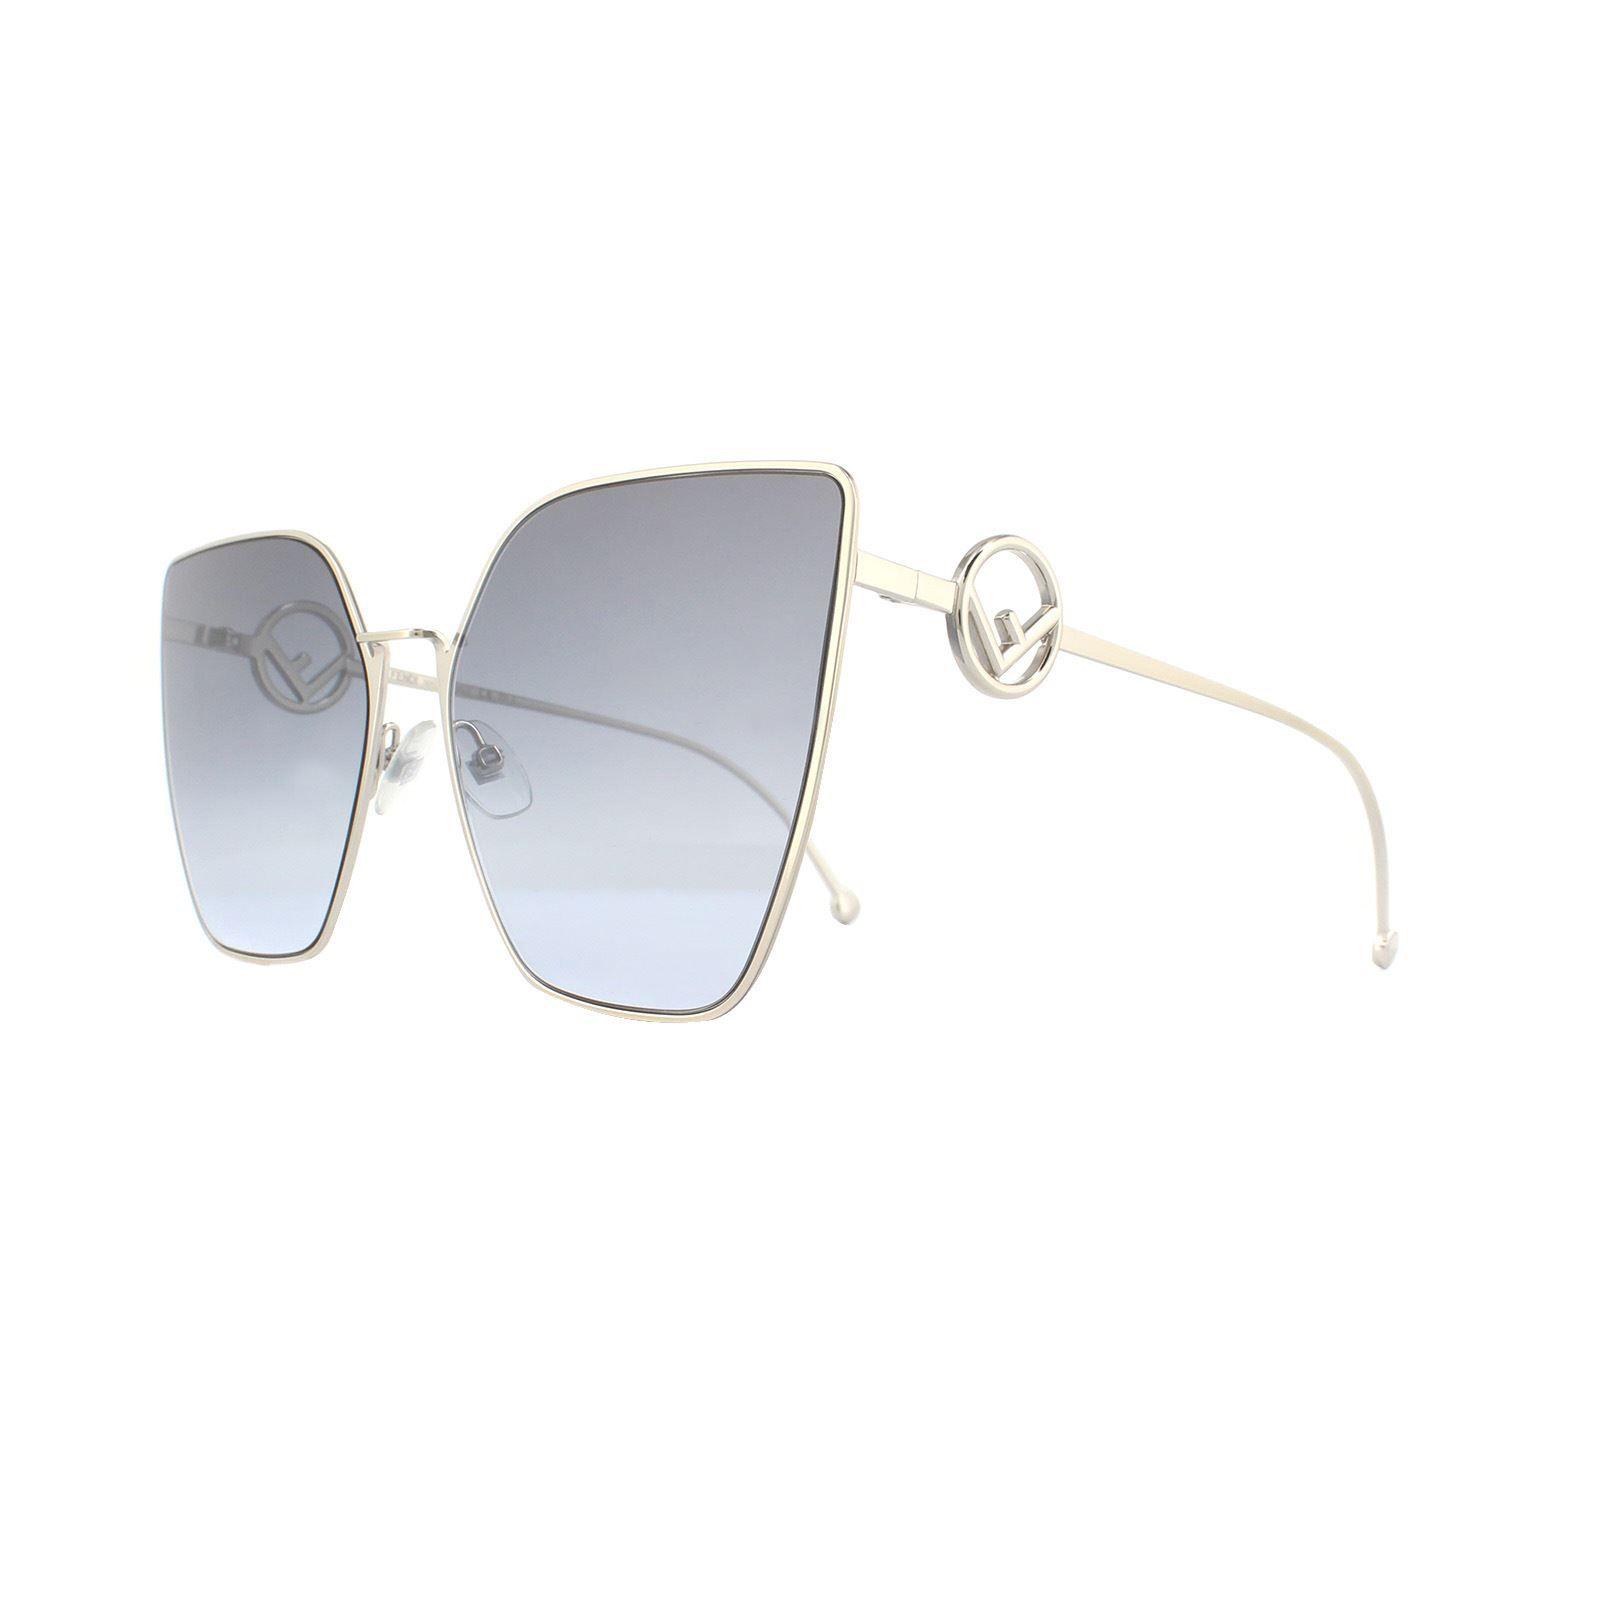 Fendi Sunglasses 0323/S 3YG GB Grey Gold Grey Gradient